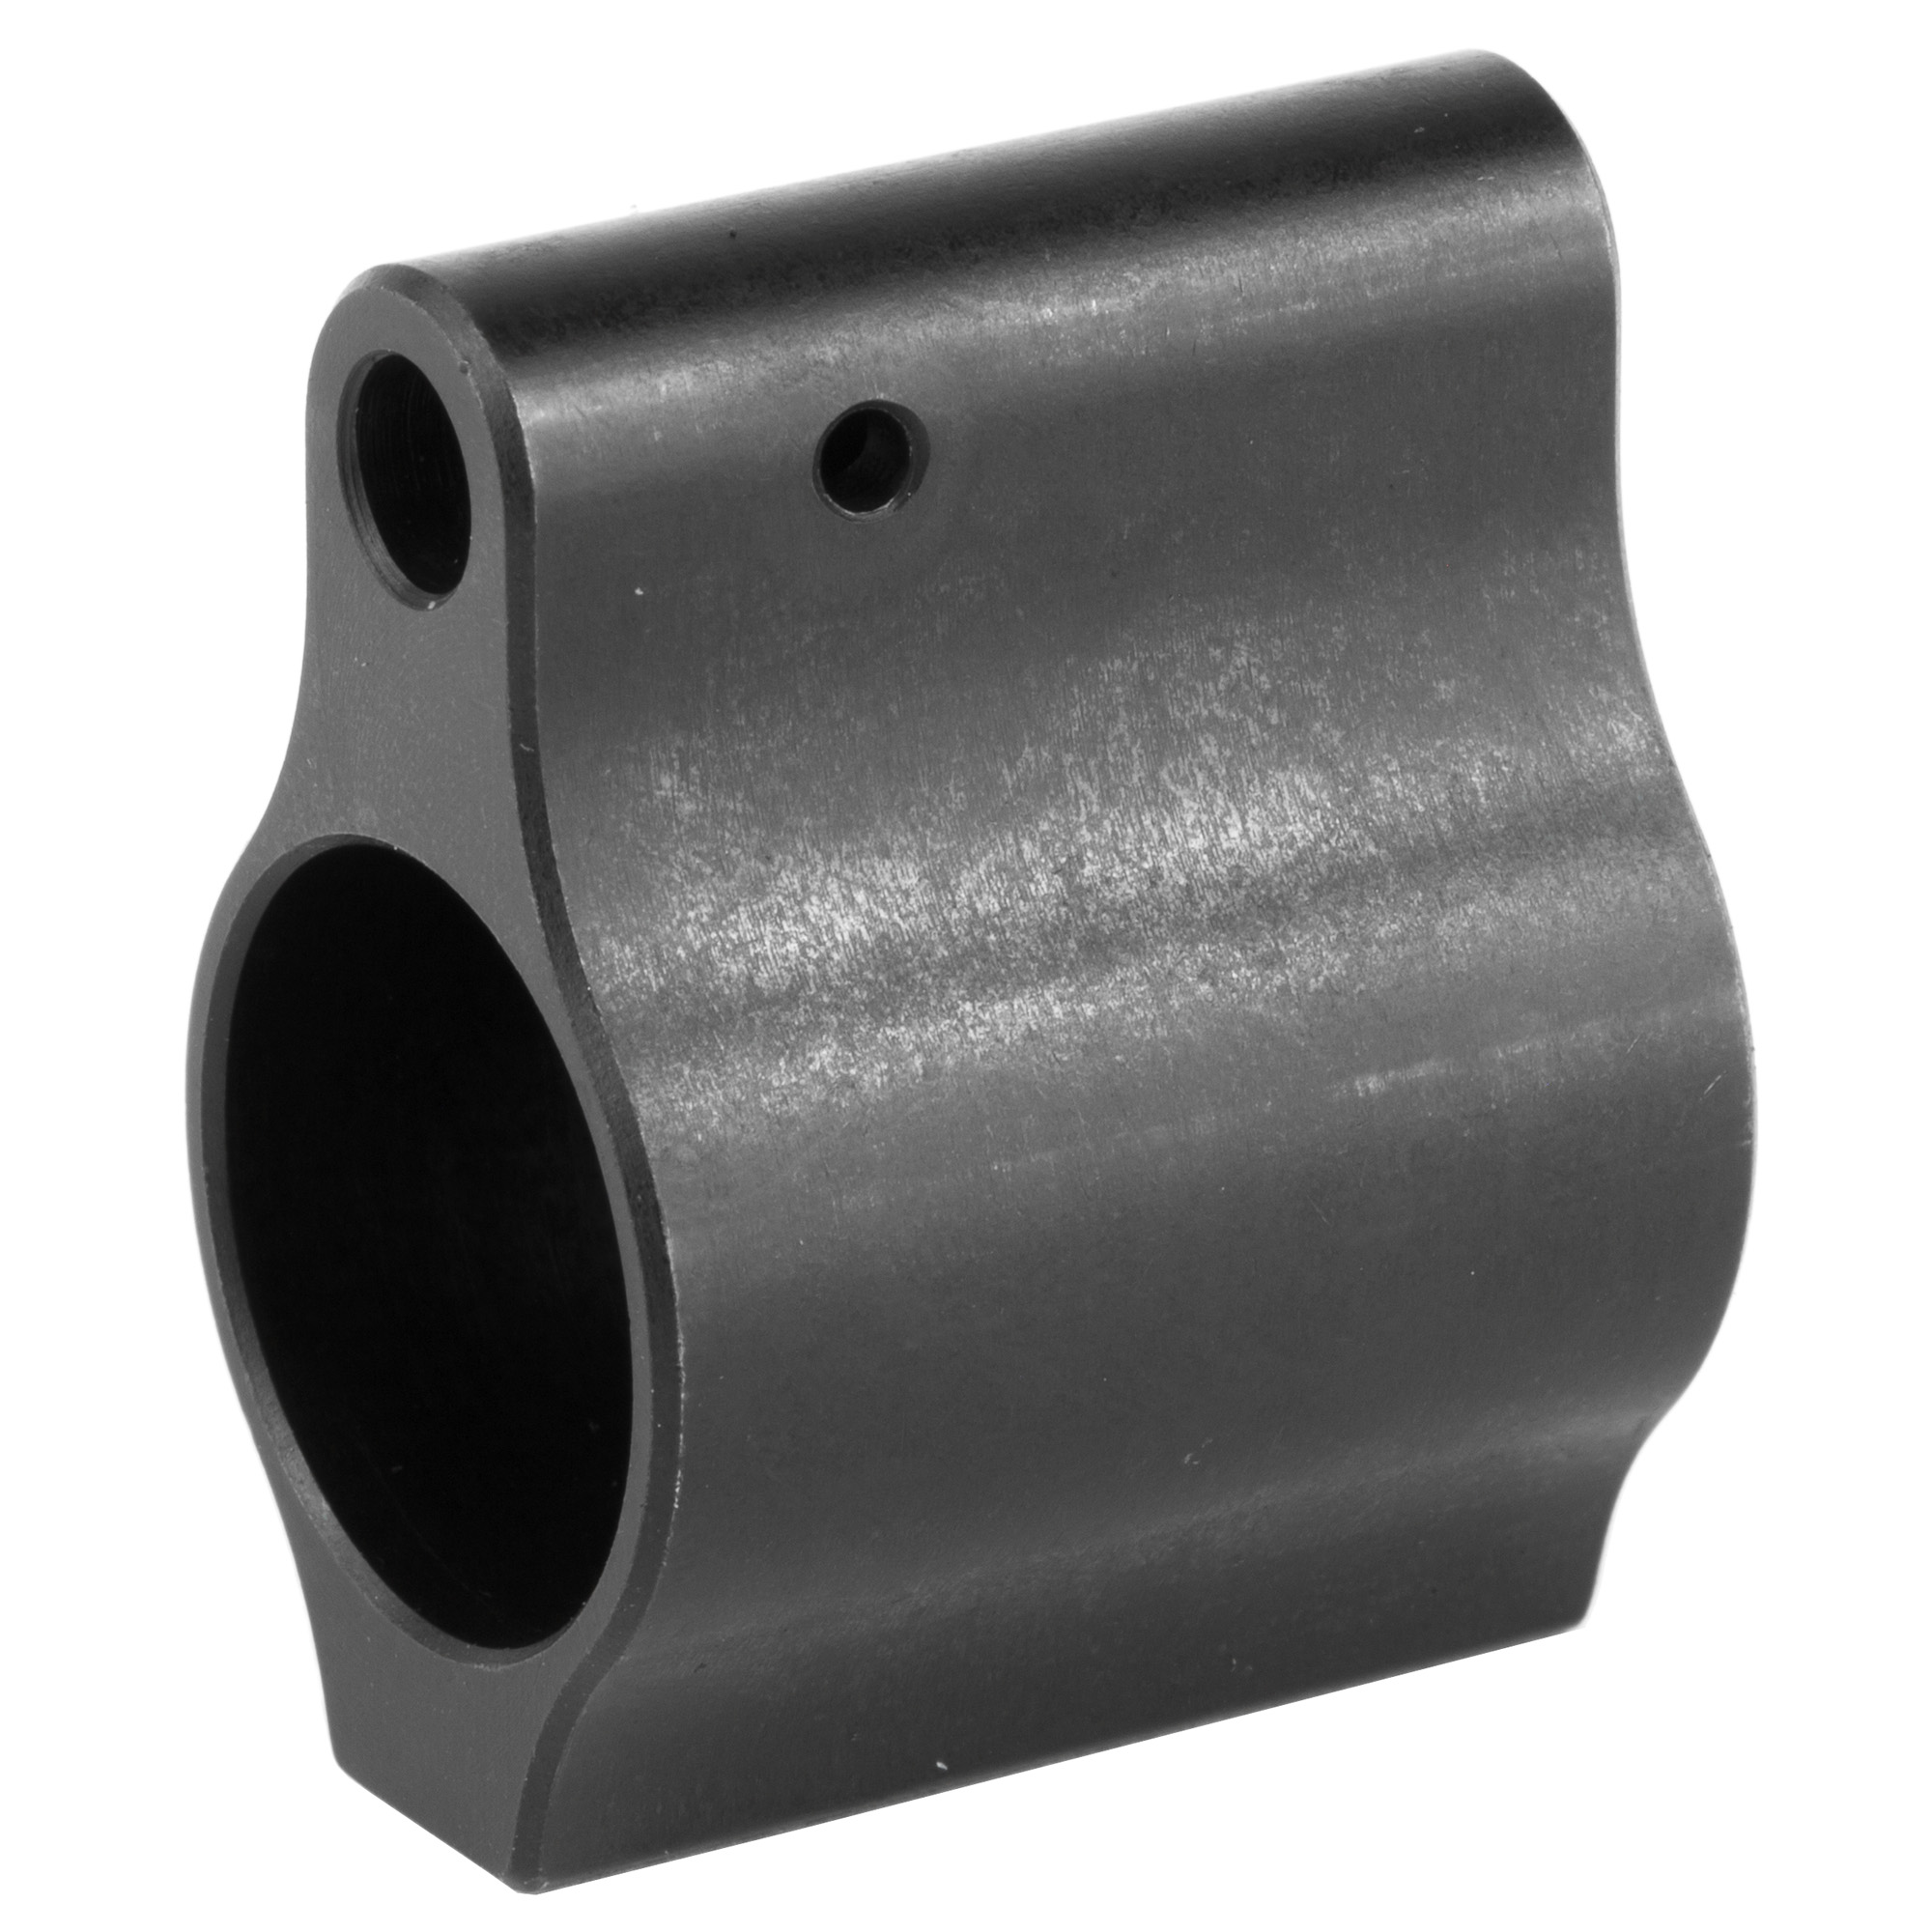 ".625"" Low profile gas block. Includes installation screws."